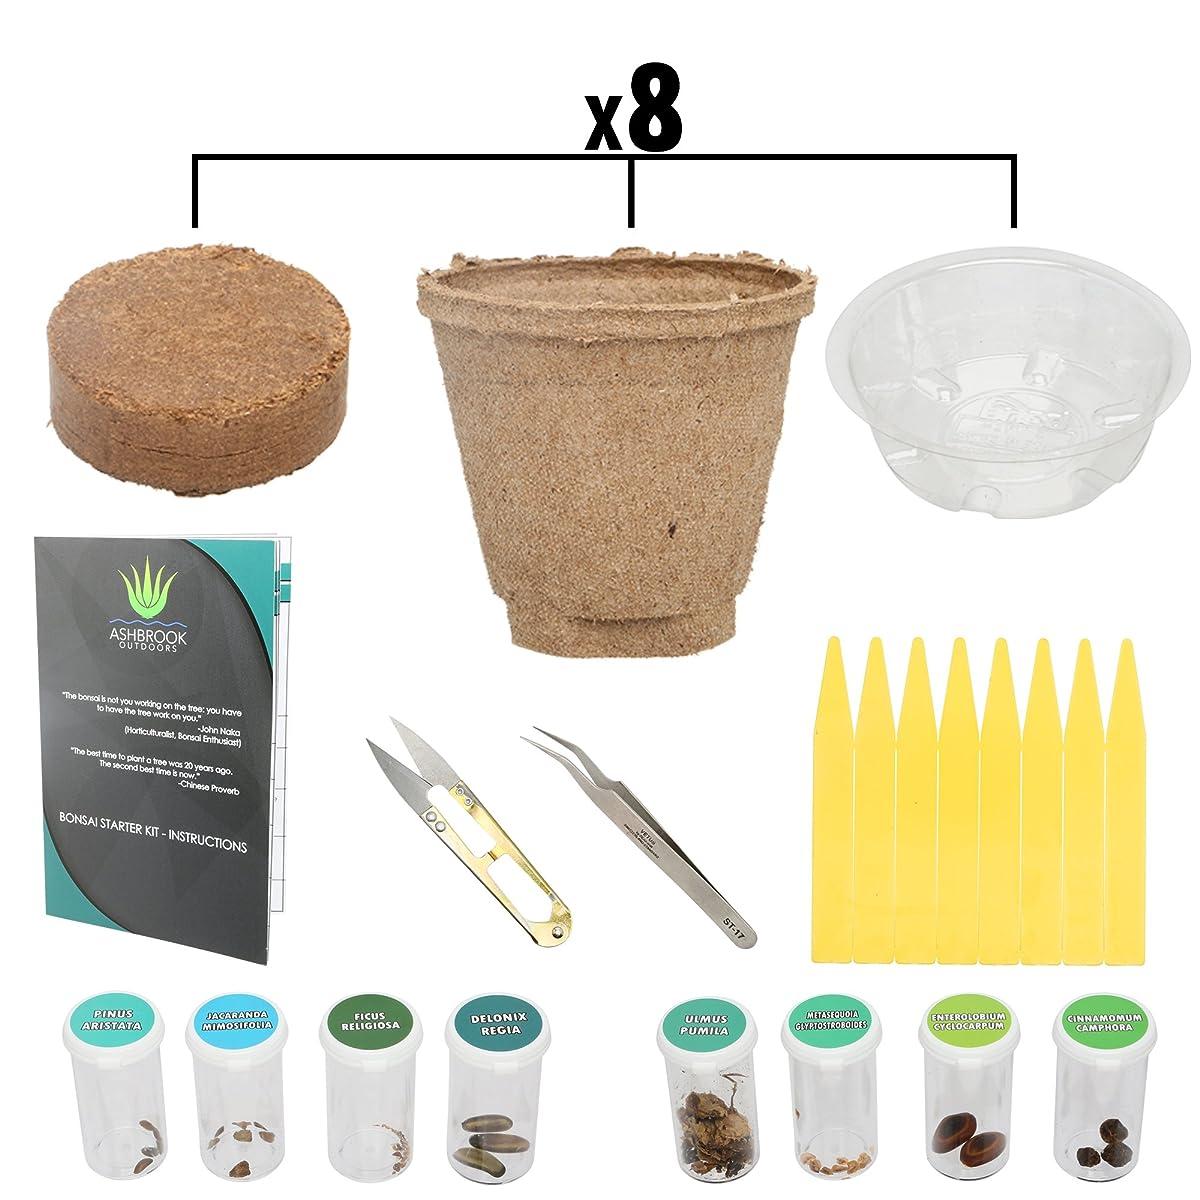 Ashbrook Outdoors Bonsai Starter Kit - Everything You Need to Grow 8 Colorful Bonzai Trees - Complete Gardening Set